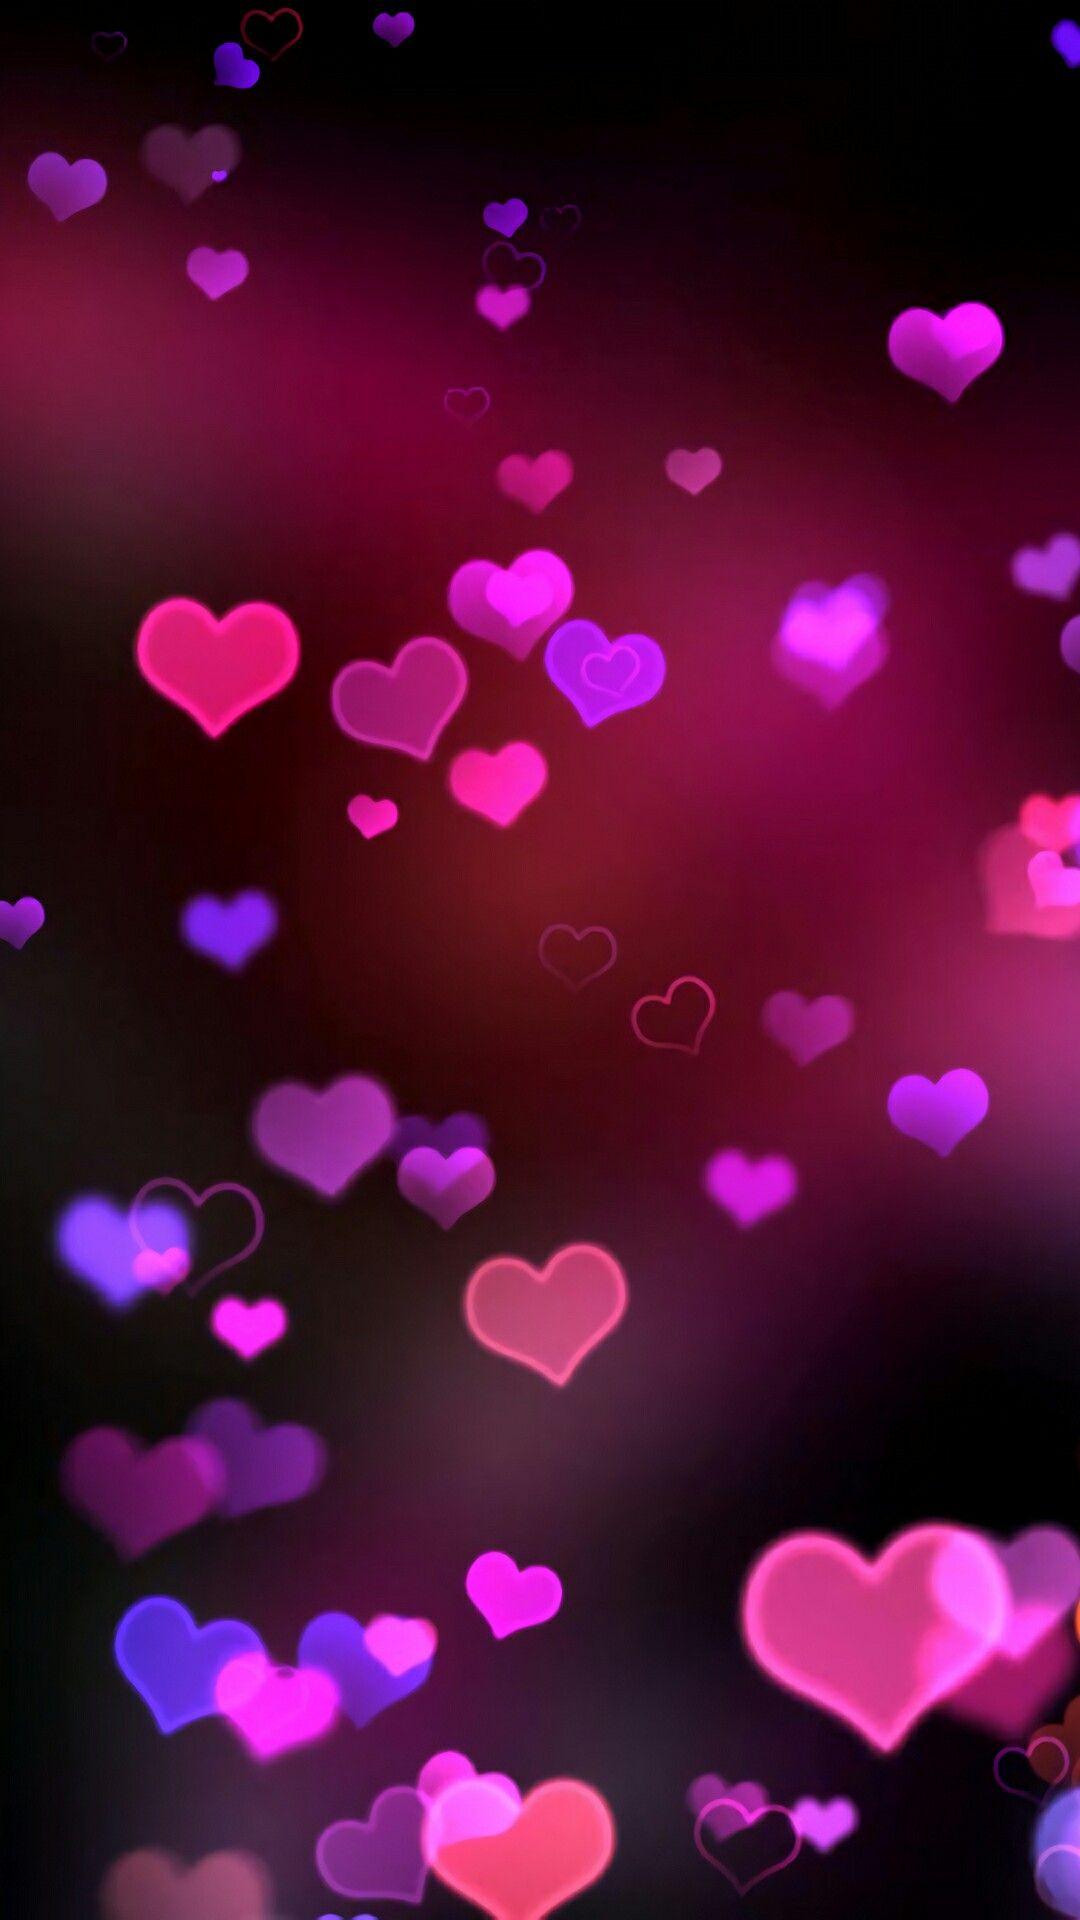 310 Hearts Love Ideas Heart Wallpaper Love Wallpaper Wallpaper